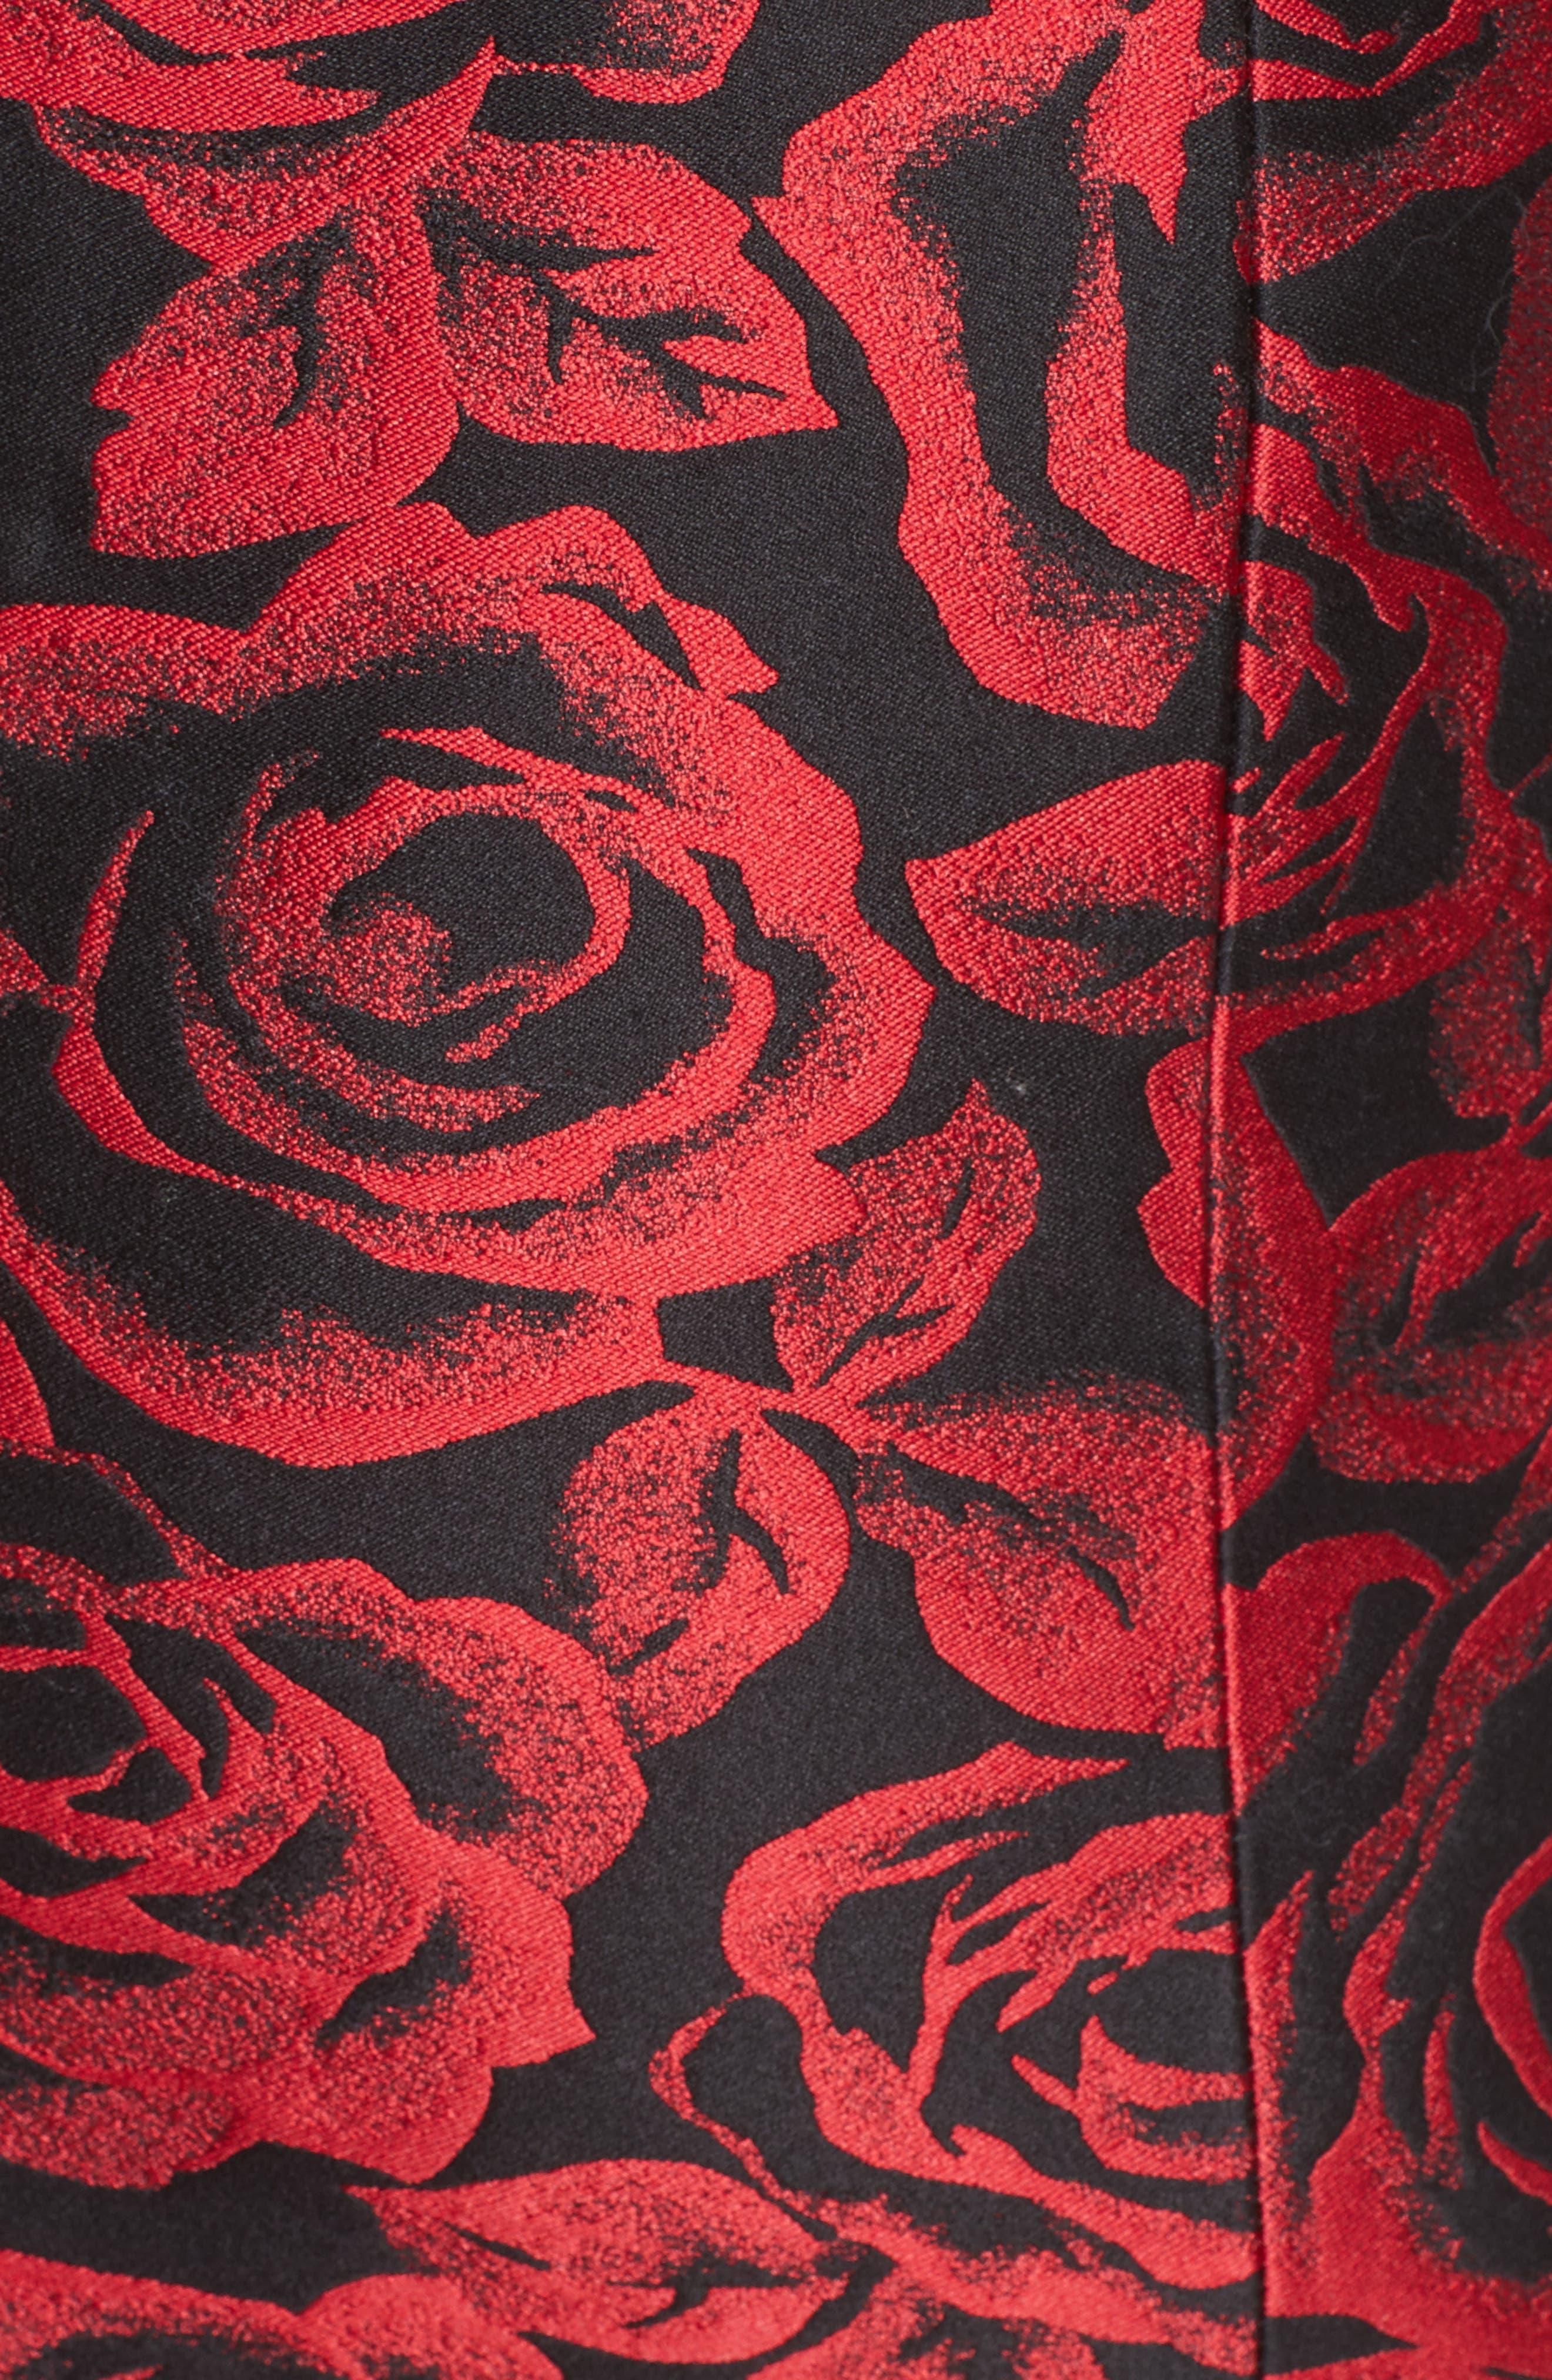 Rose Jacquard Bustier Sheath Dress,                             Alternate thumbnail 5, color,                             611